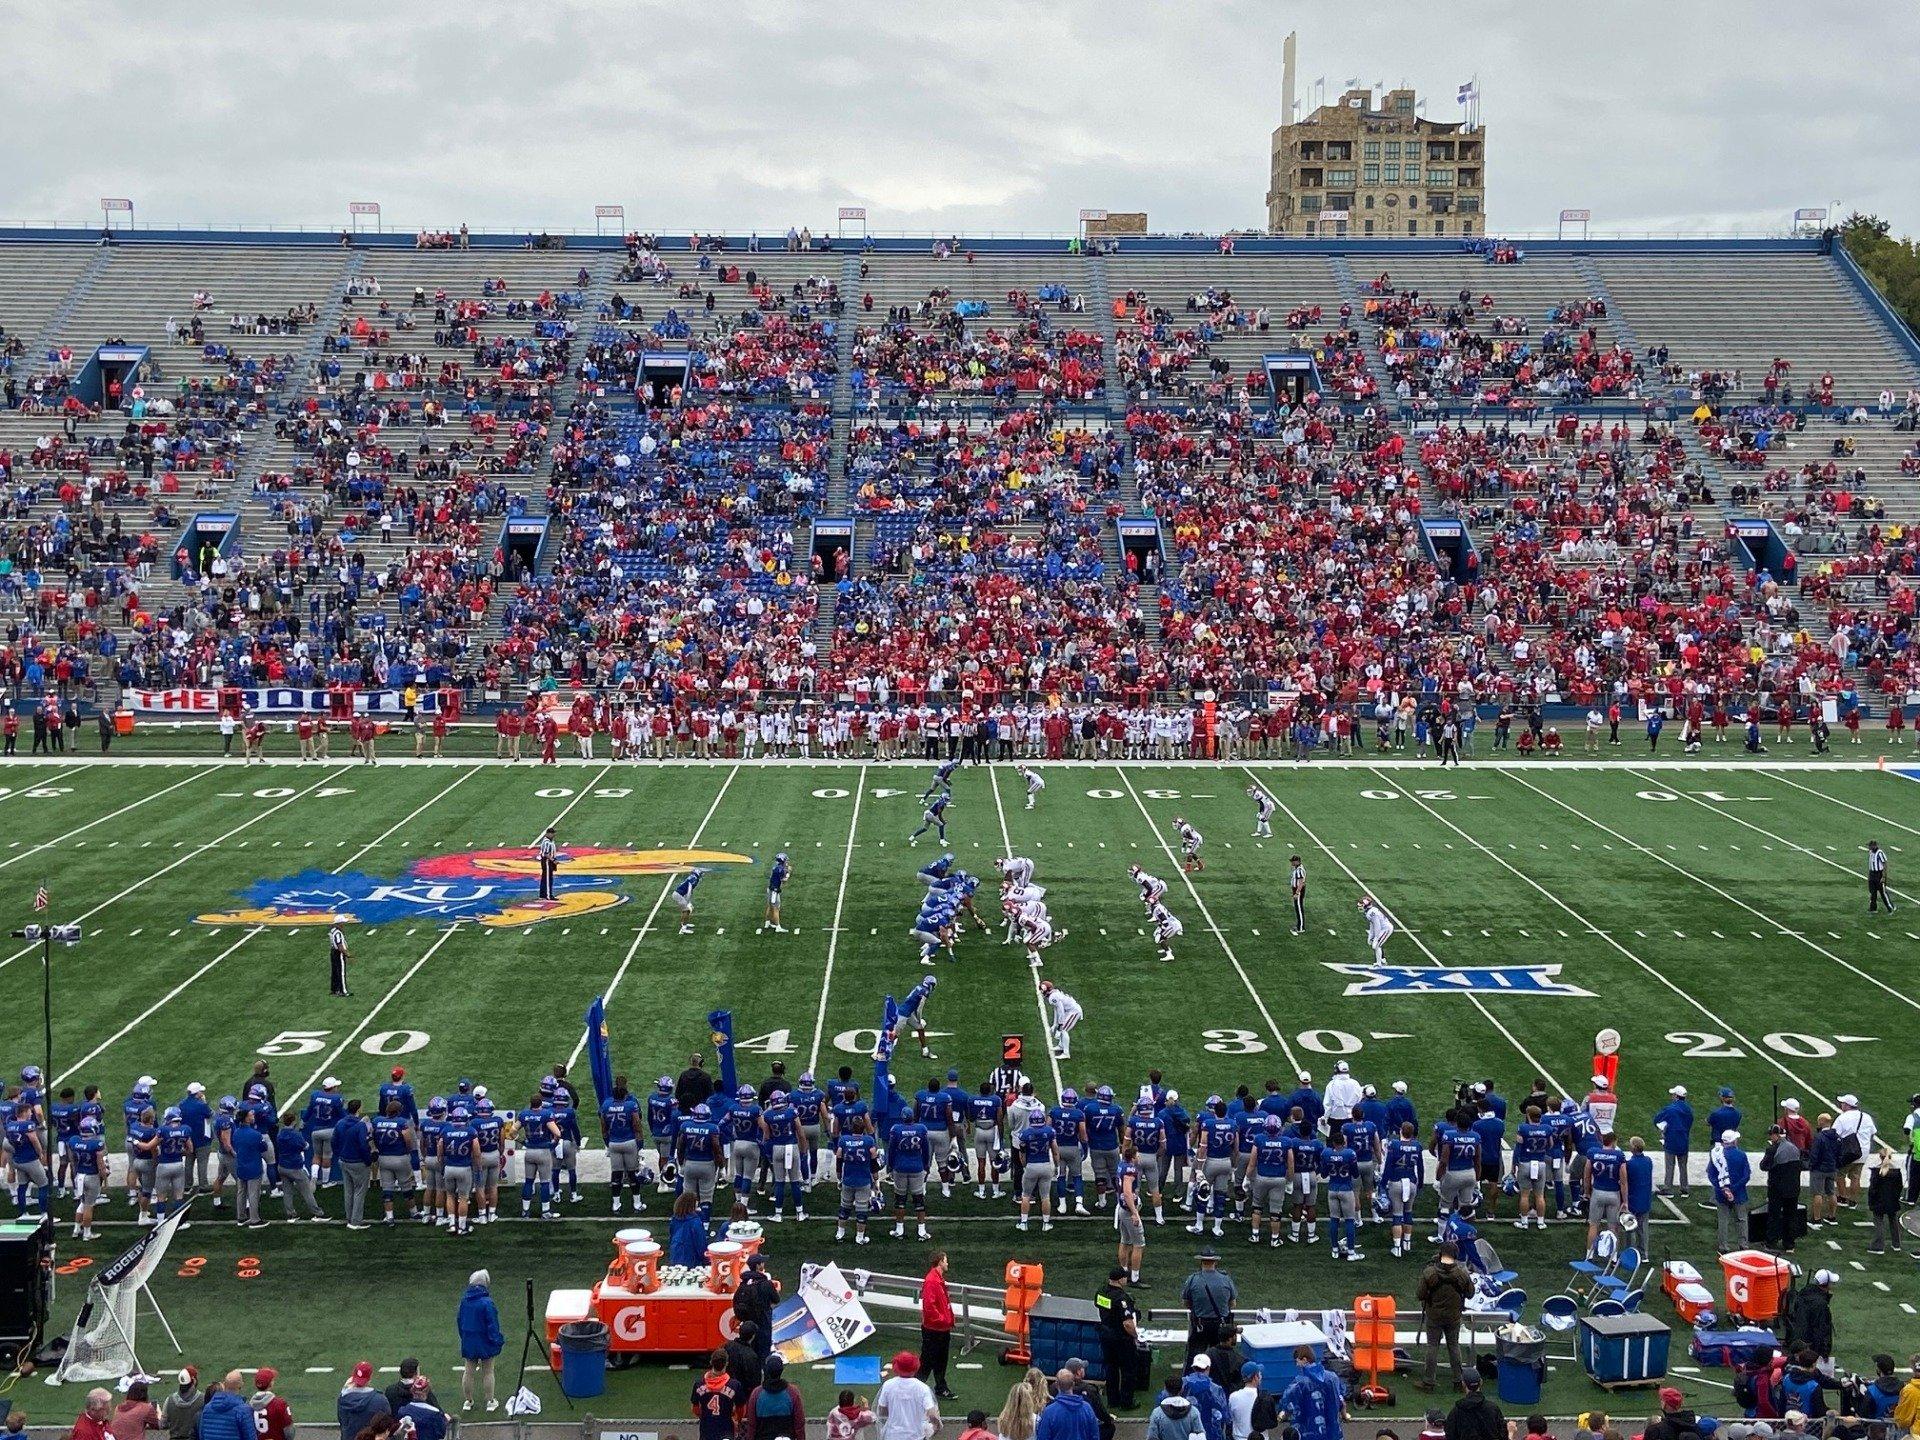 David Booth Kansas Memorial Stadium Section 5 Row 37 Seat 21